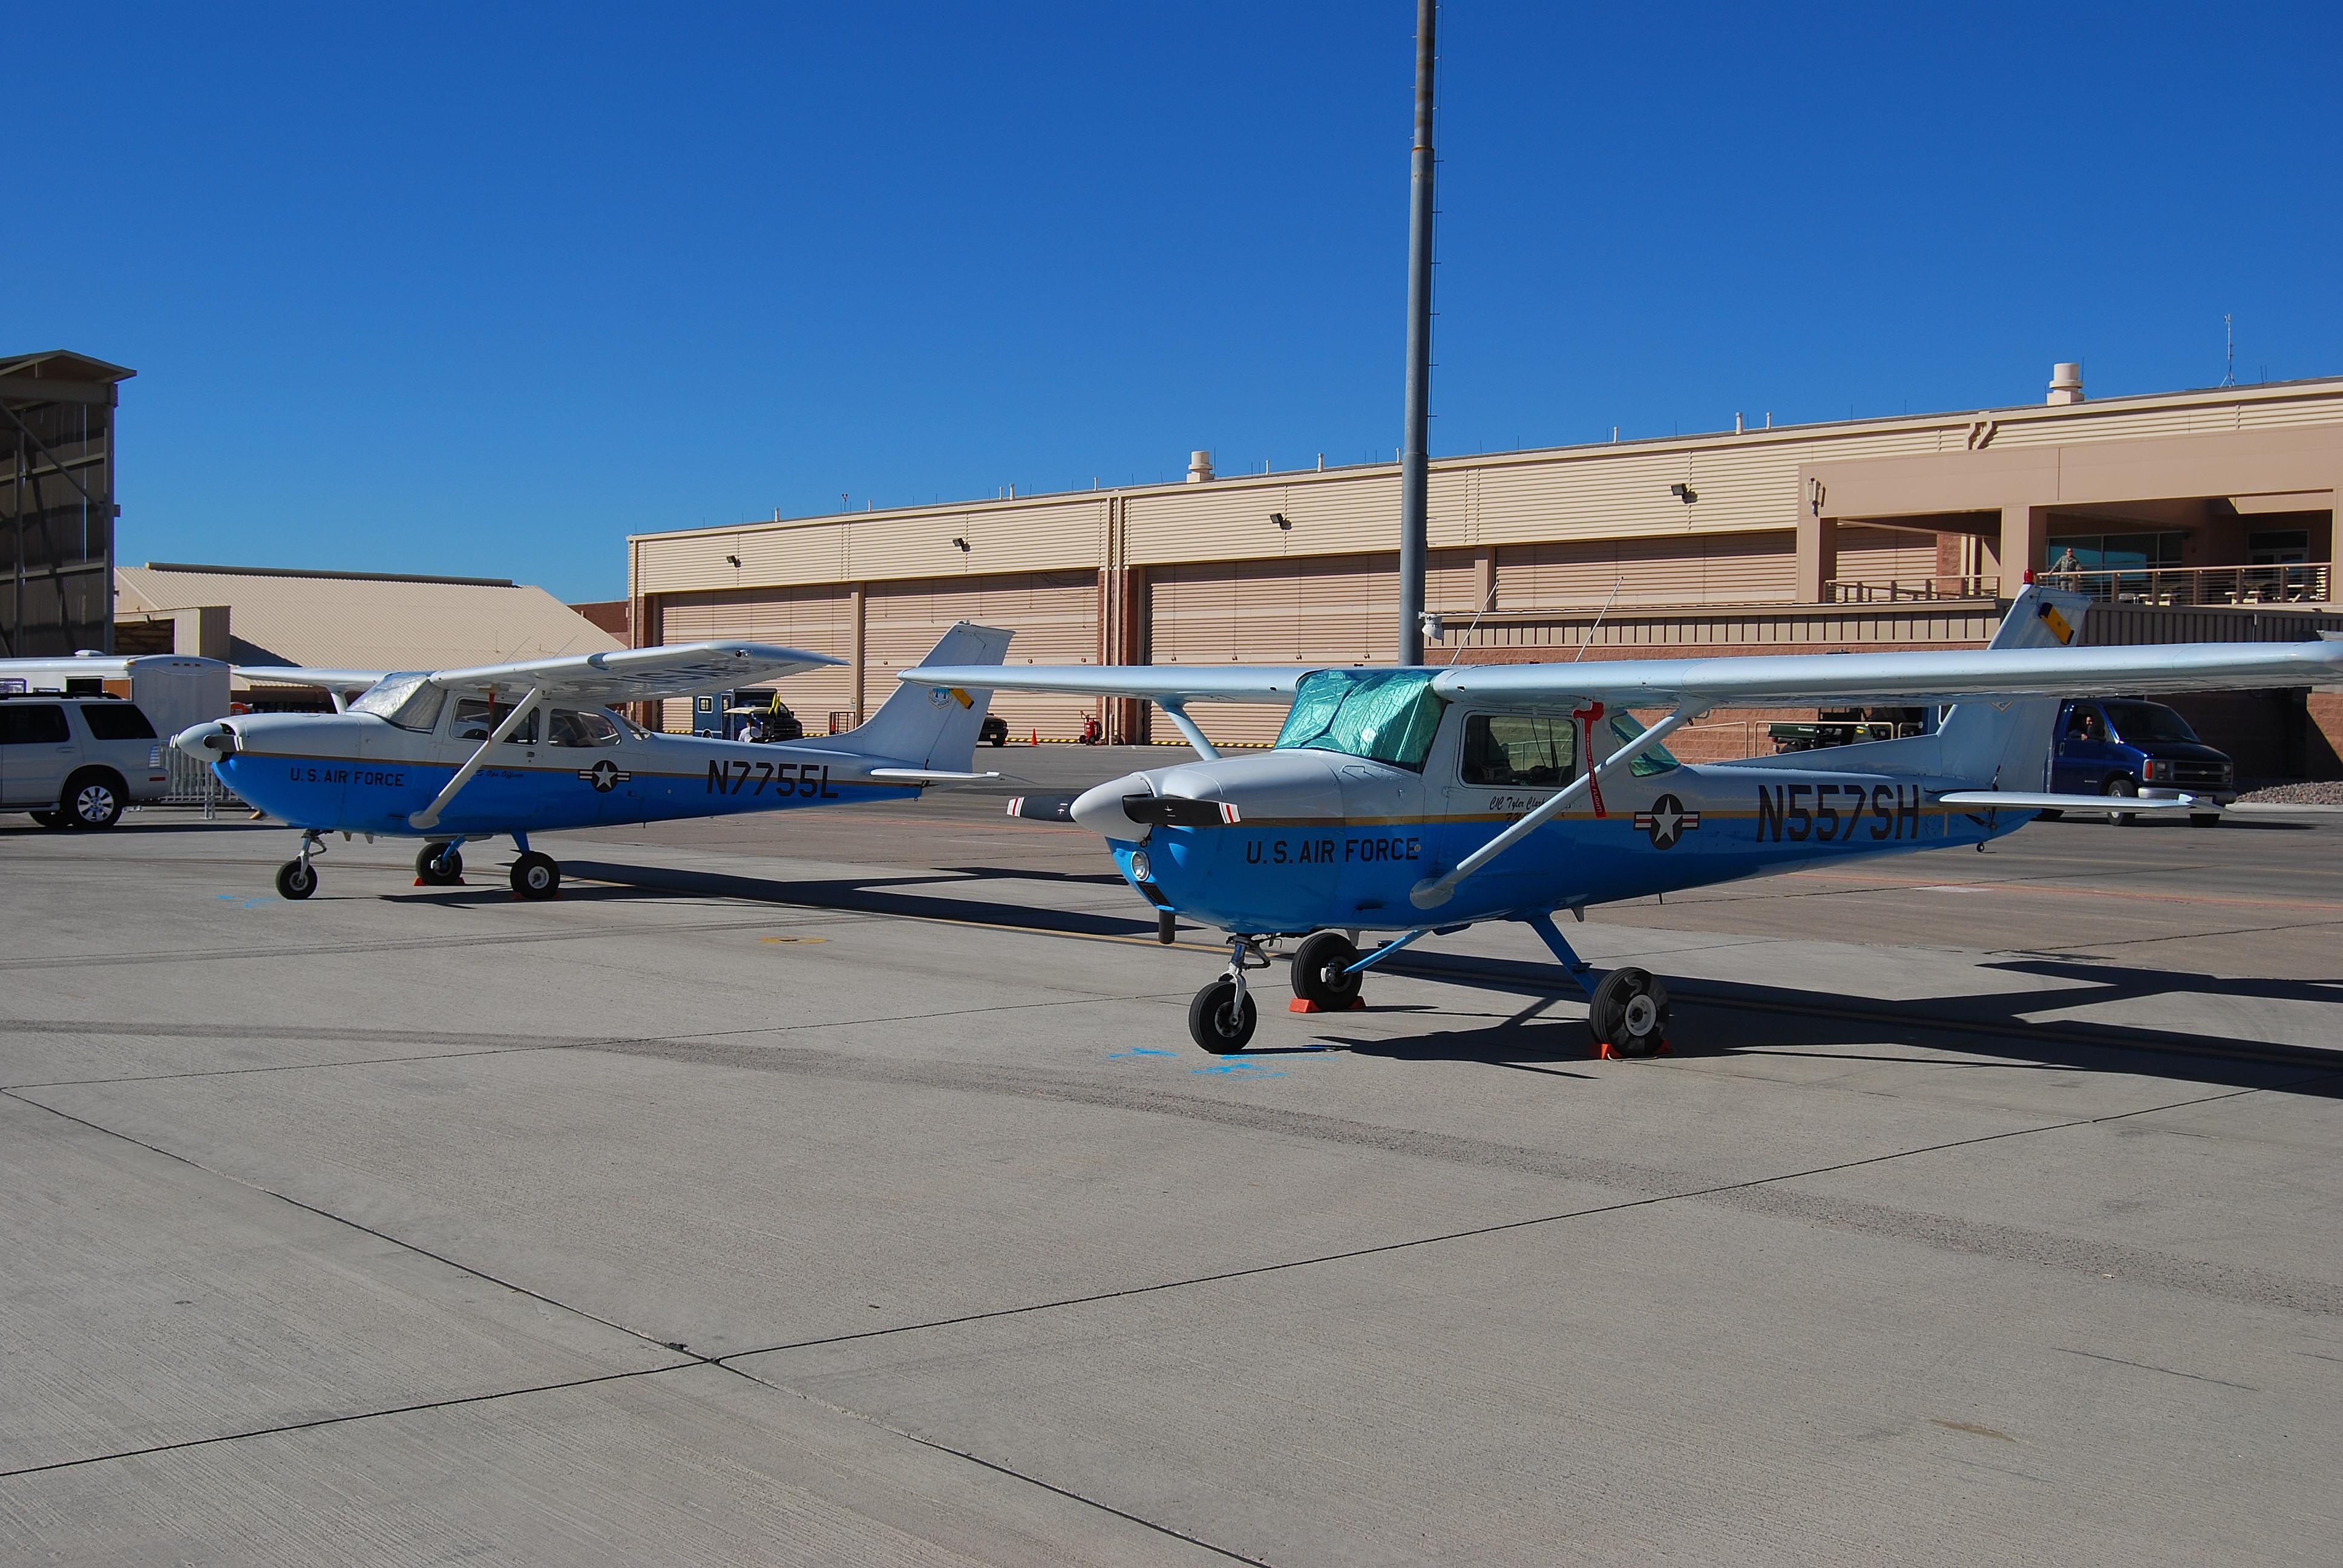 File:Cessna 150 & Cessna 172 USAF (3011846318) jpg